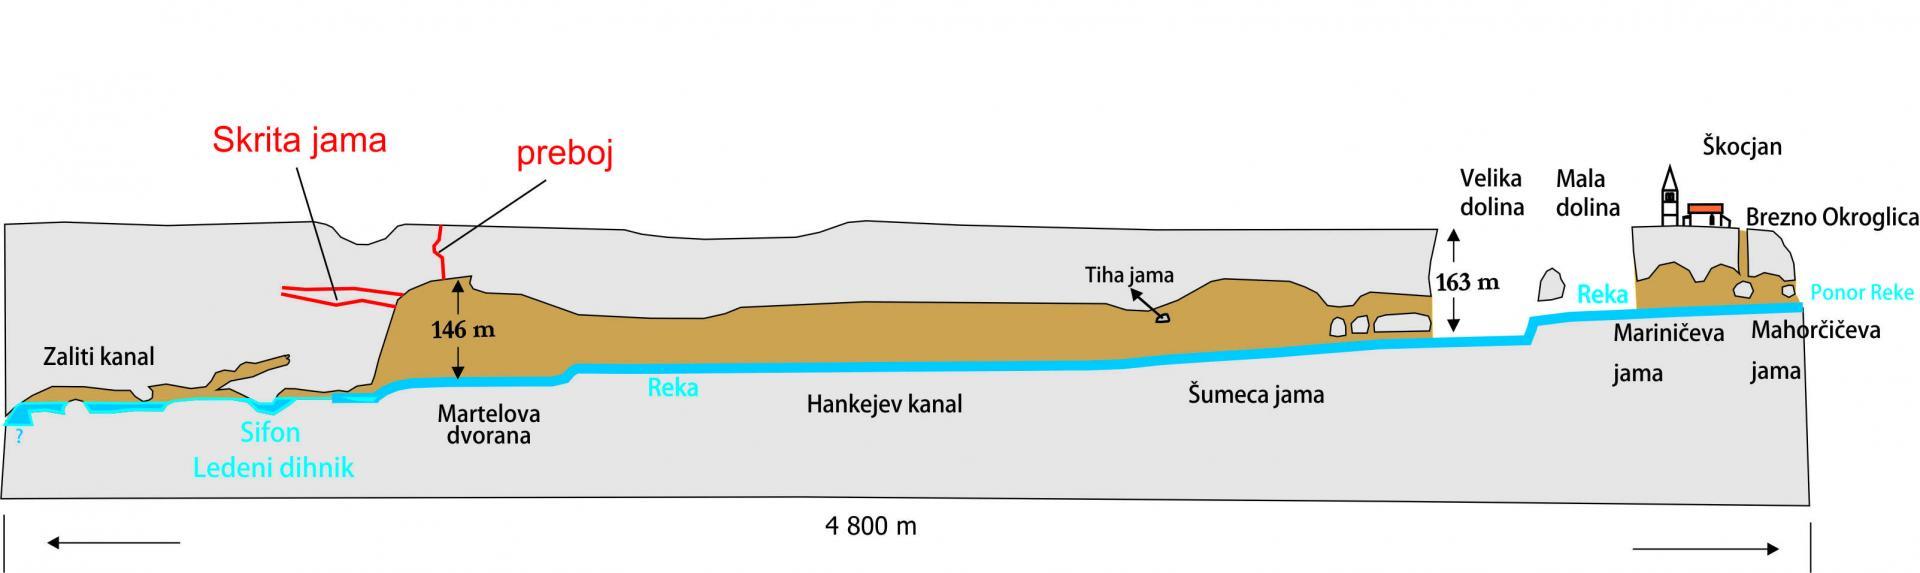 Perfil del conjunto karstico de la cueva de Skocjan